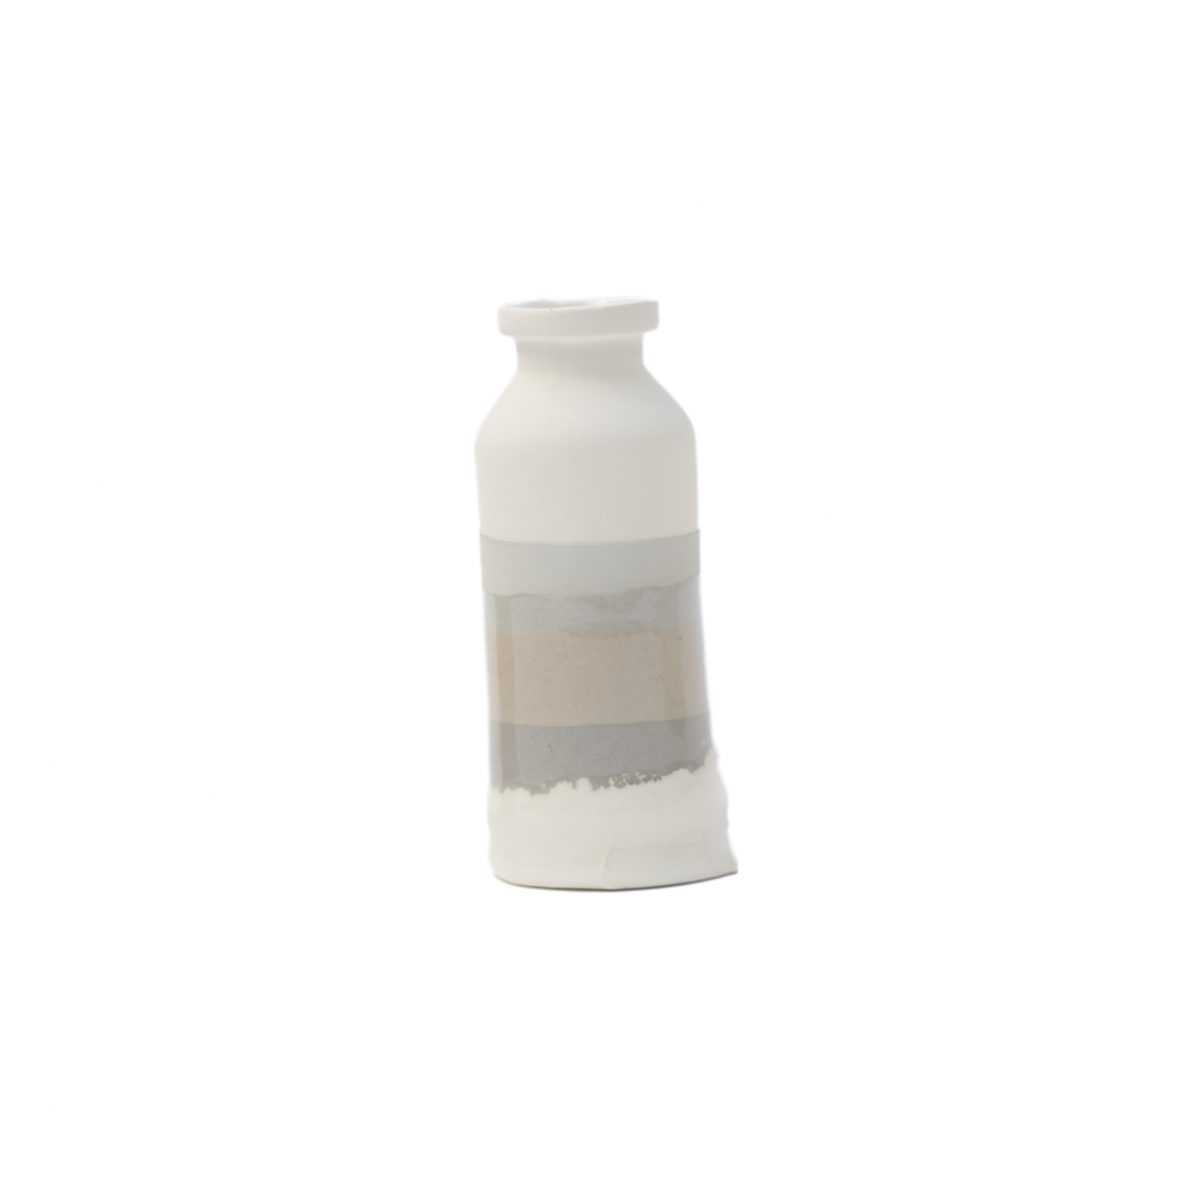 Jeroen Wand Plunge Vase Small Wit Cor Unum ceramics